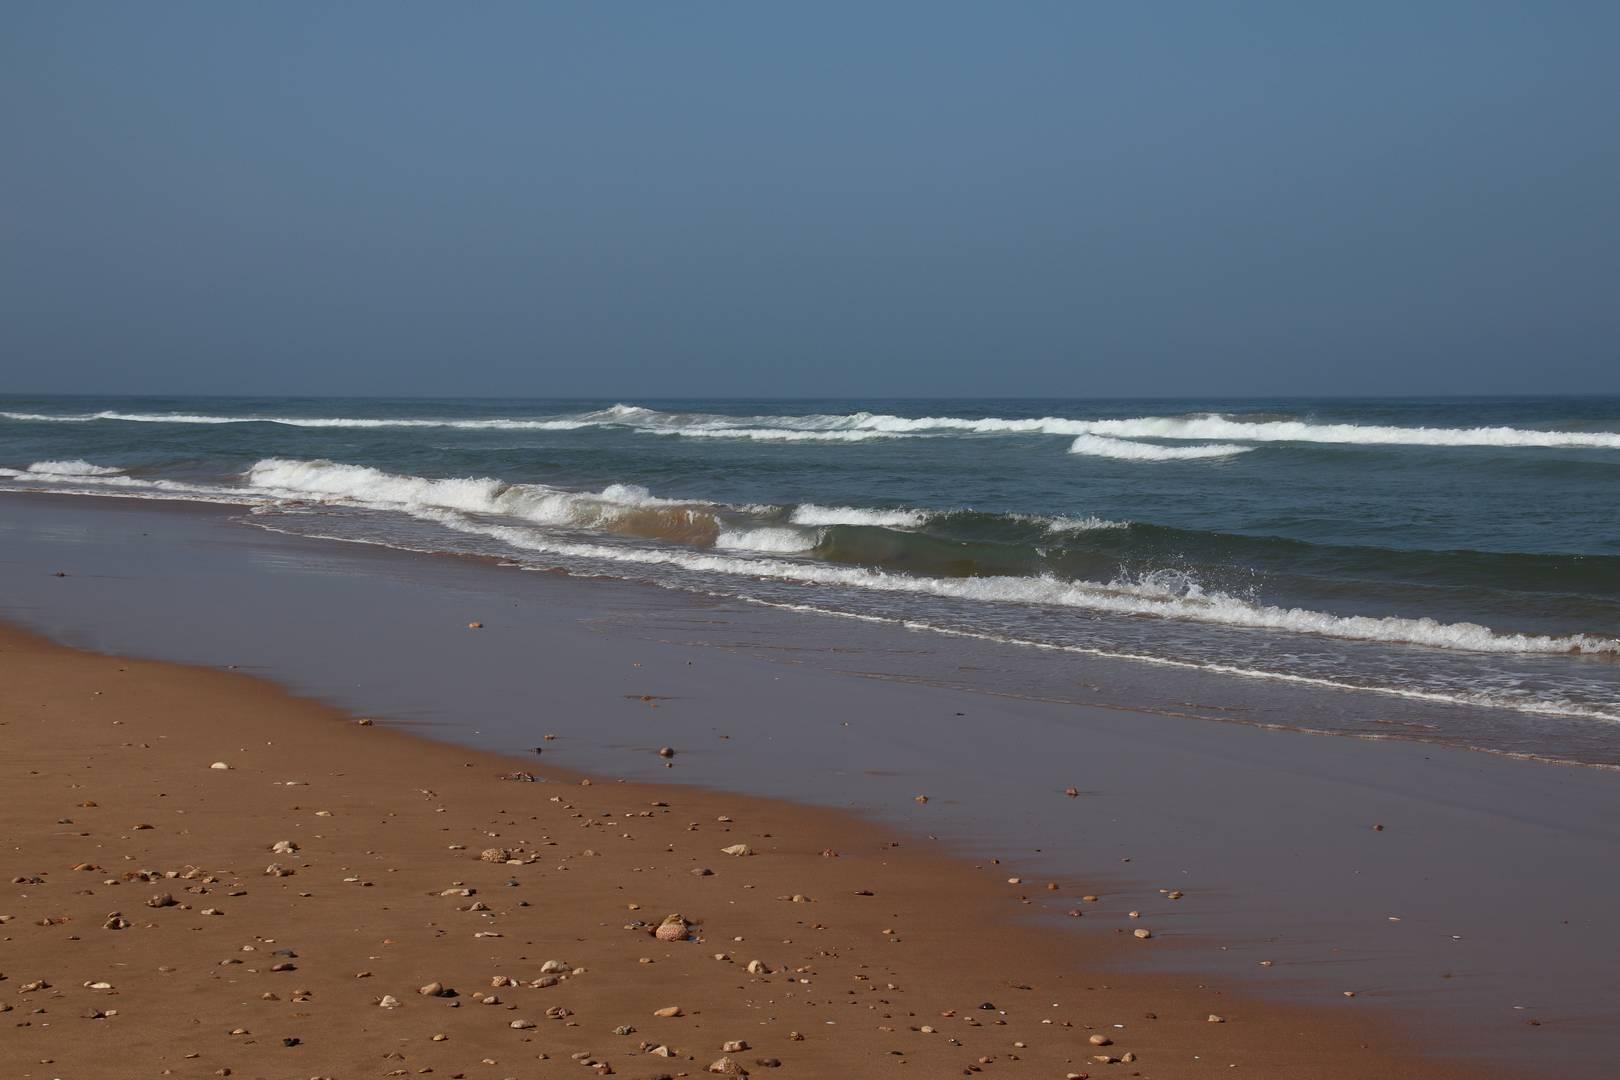 Maroc - Plage déserte au Sud d'Essaouira